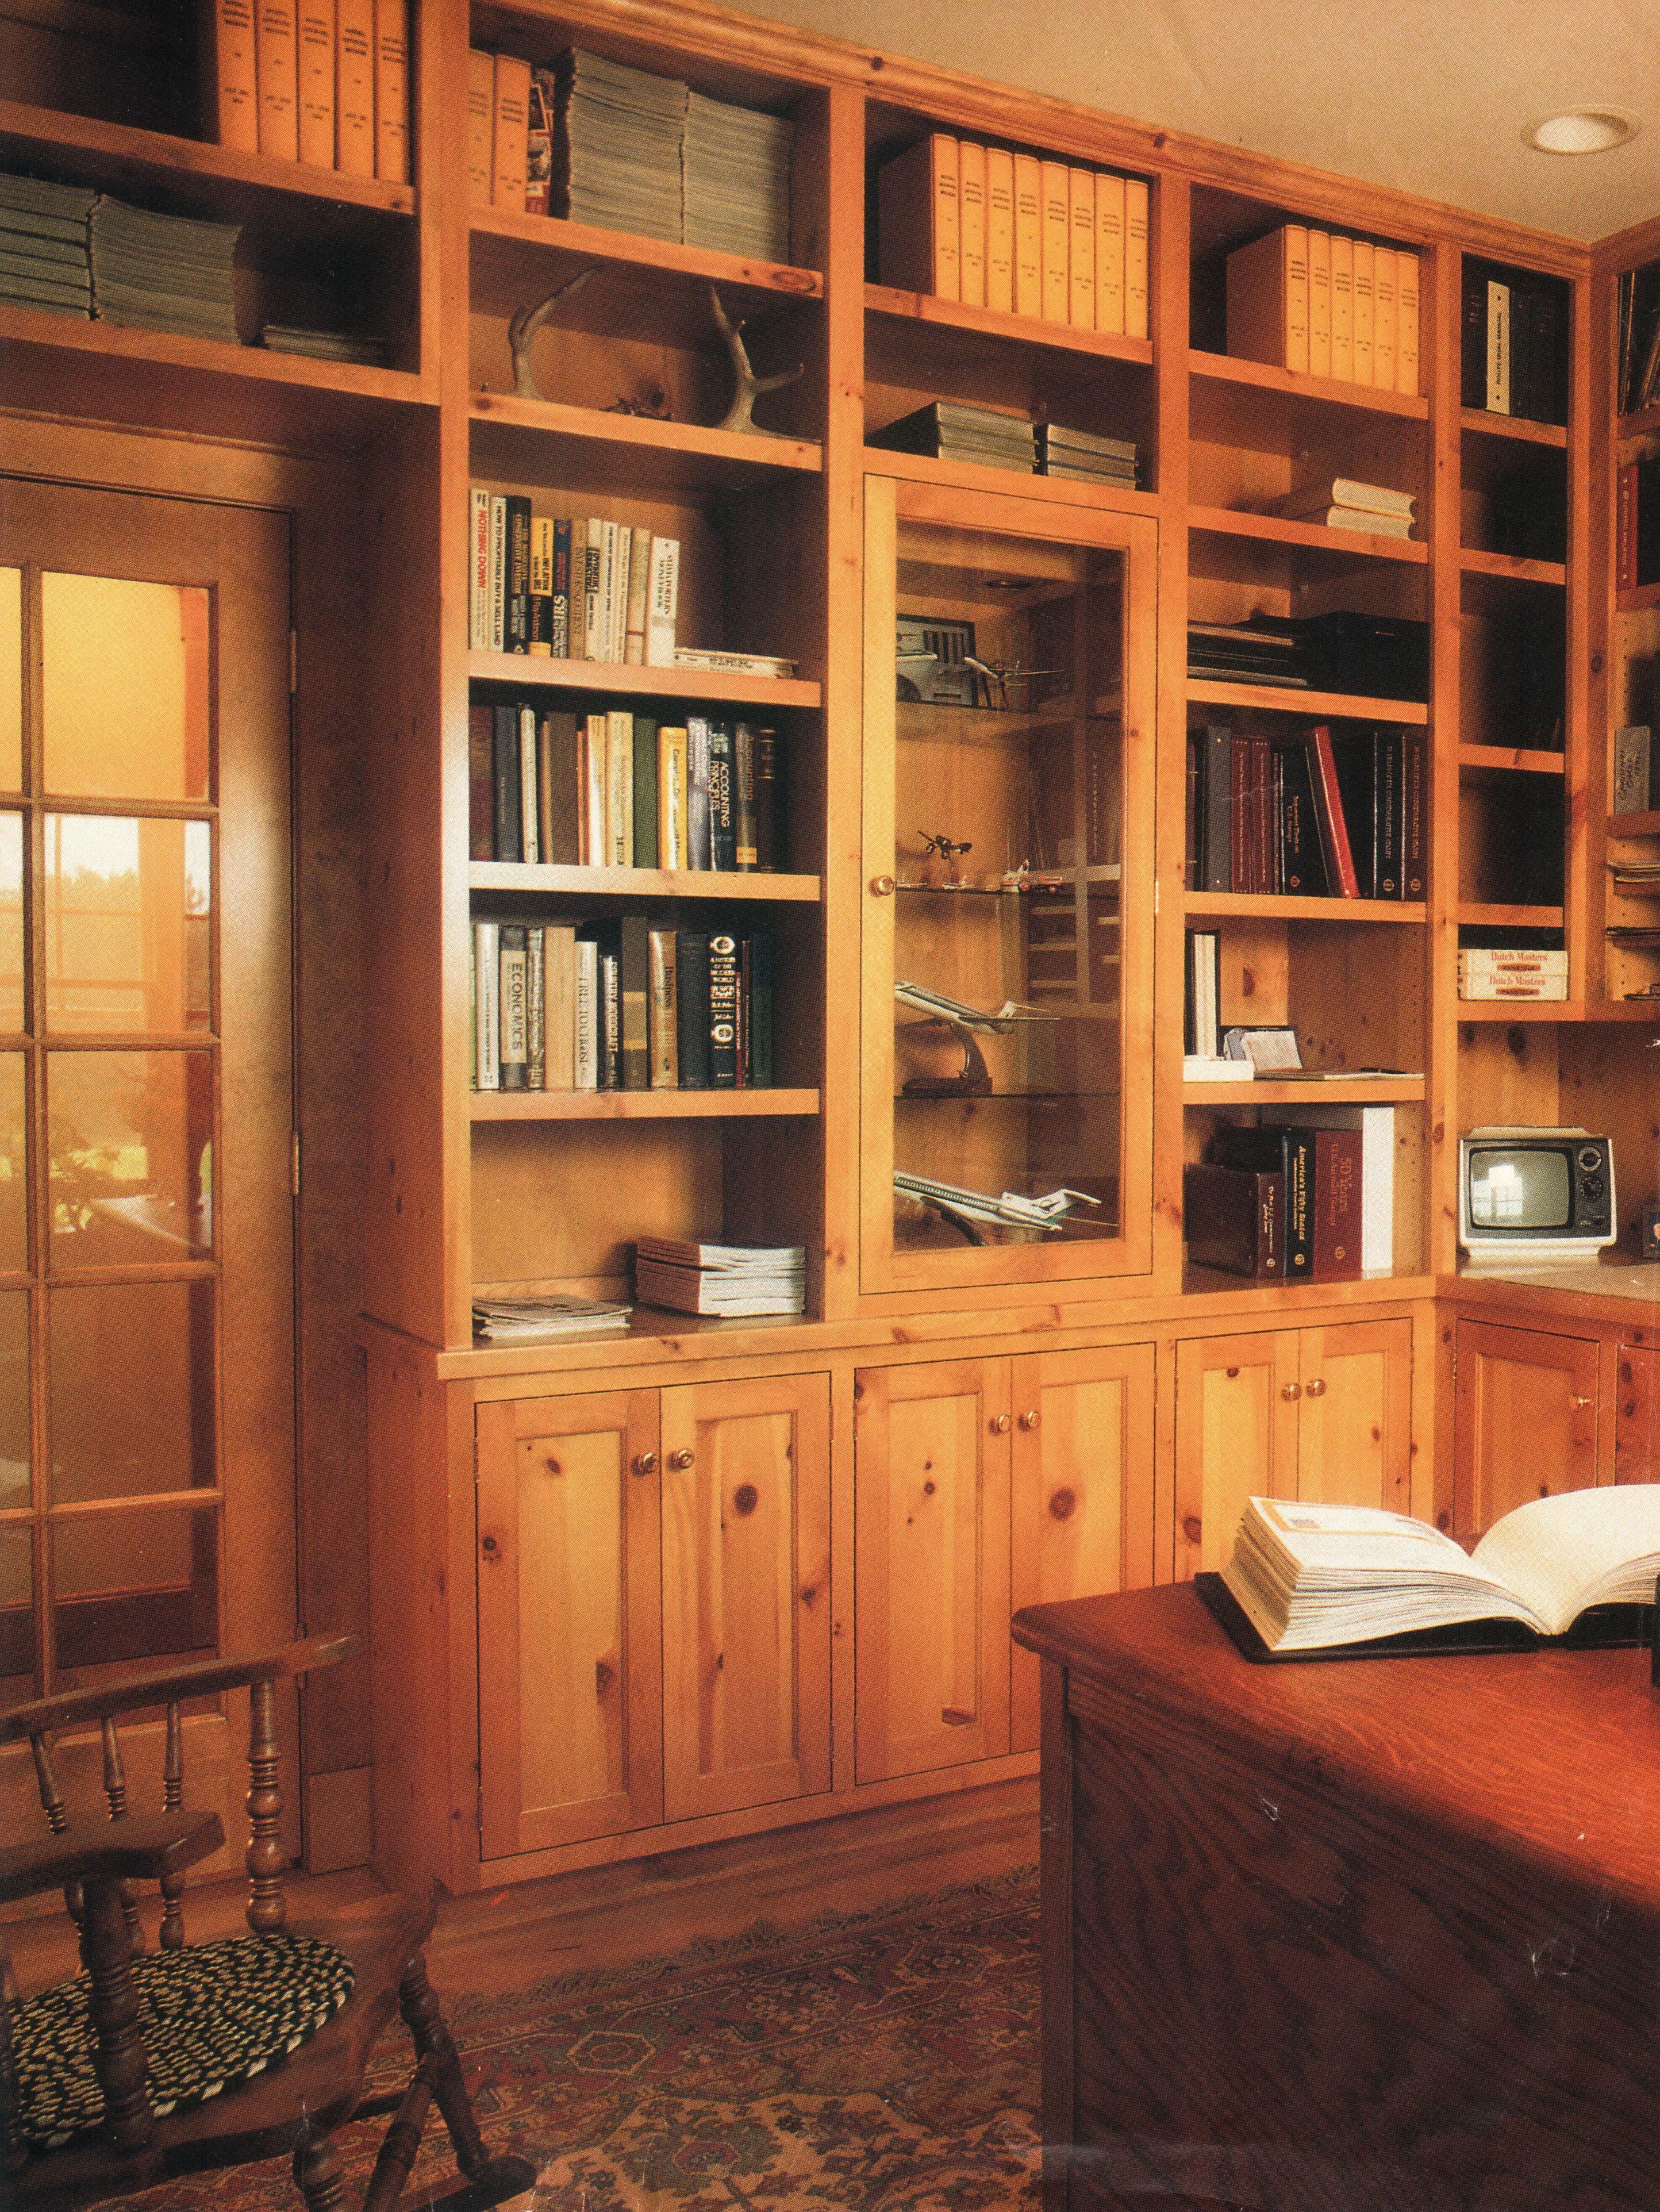 Rustic Knotty Pine Bookcases - photo via Home Plan Ideas Magazine